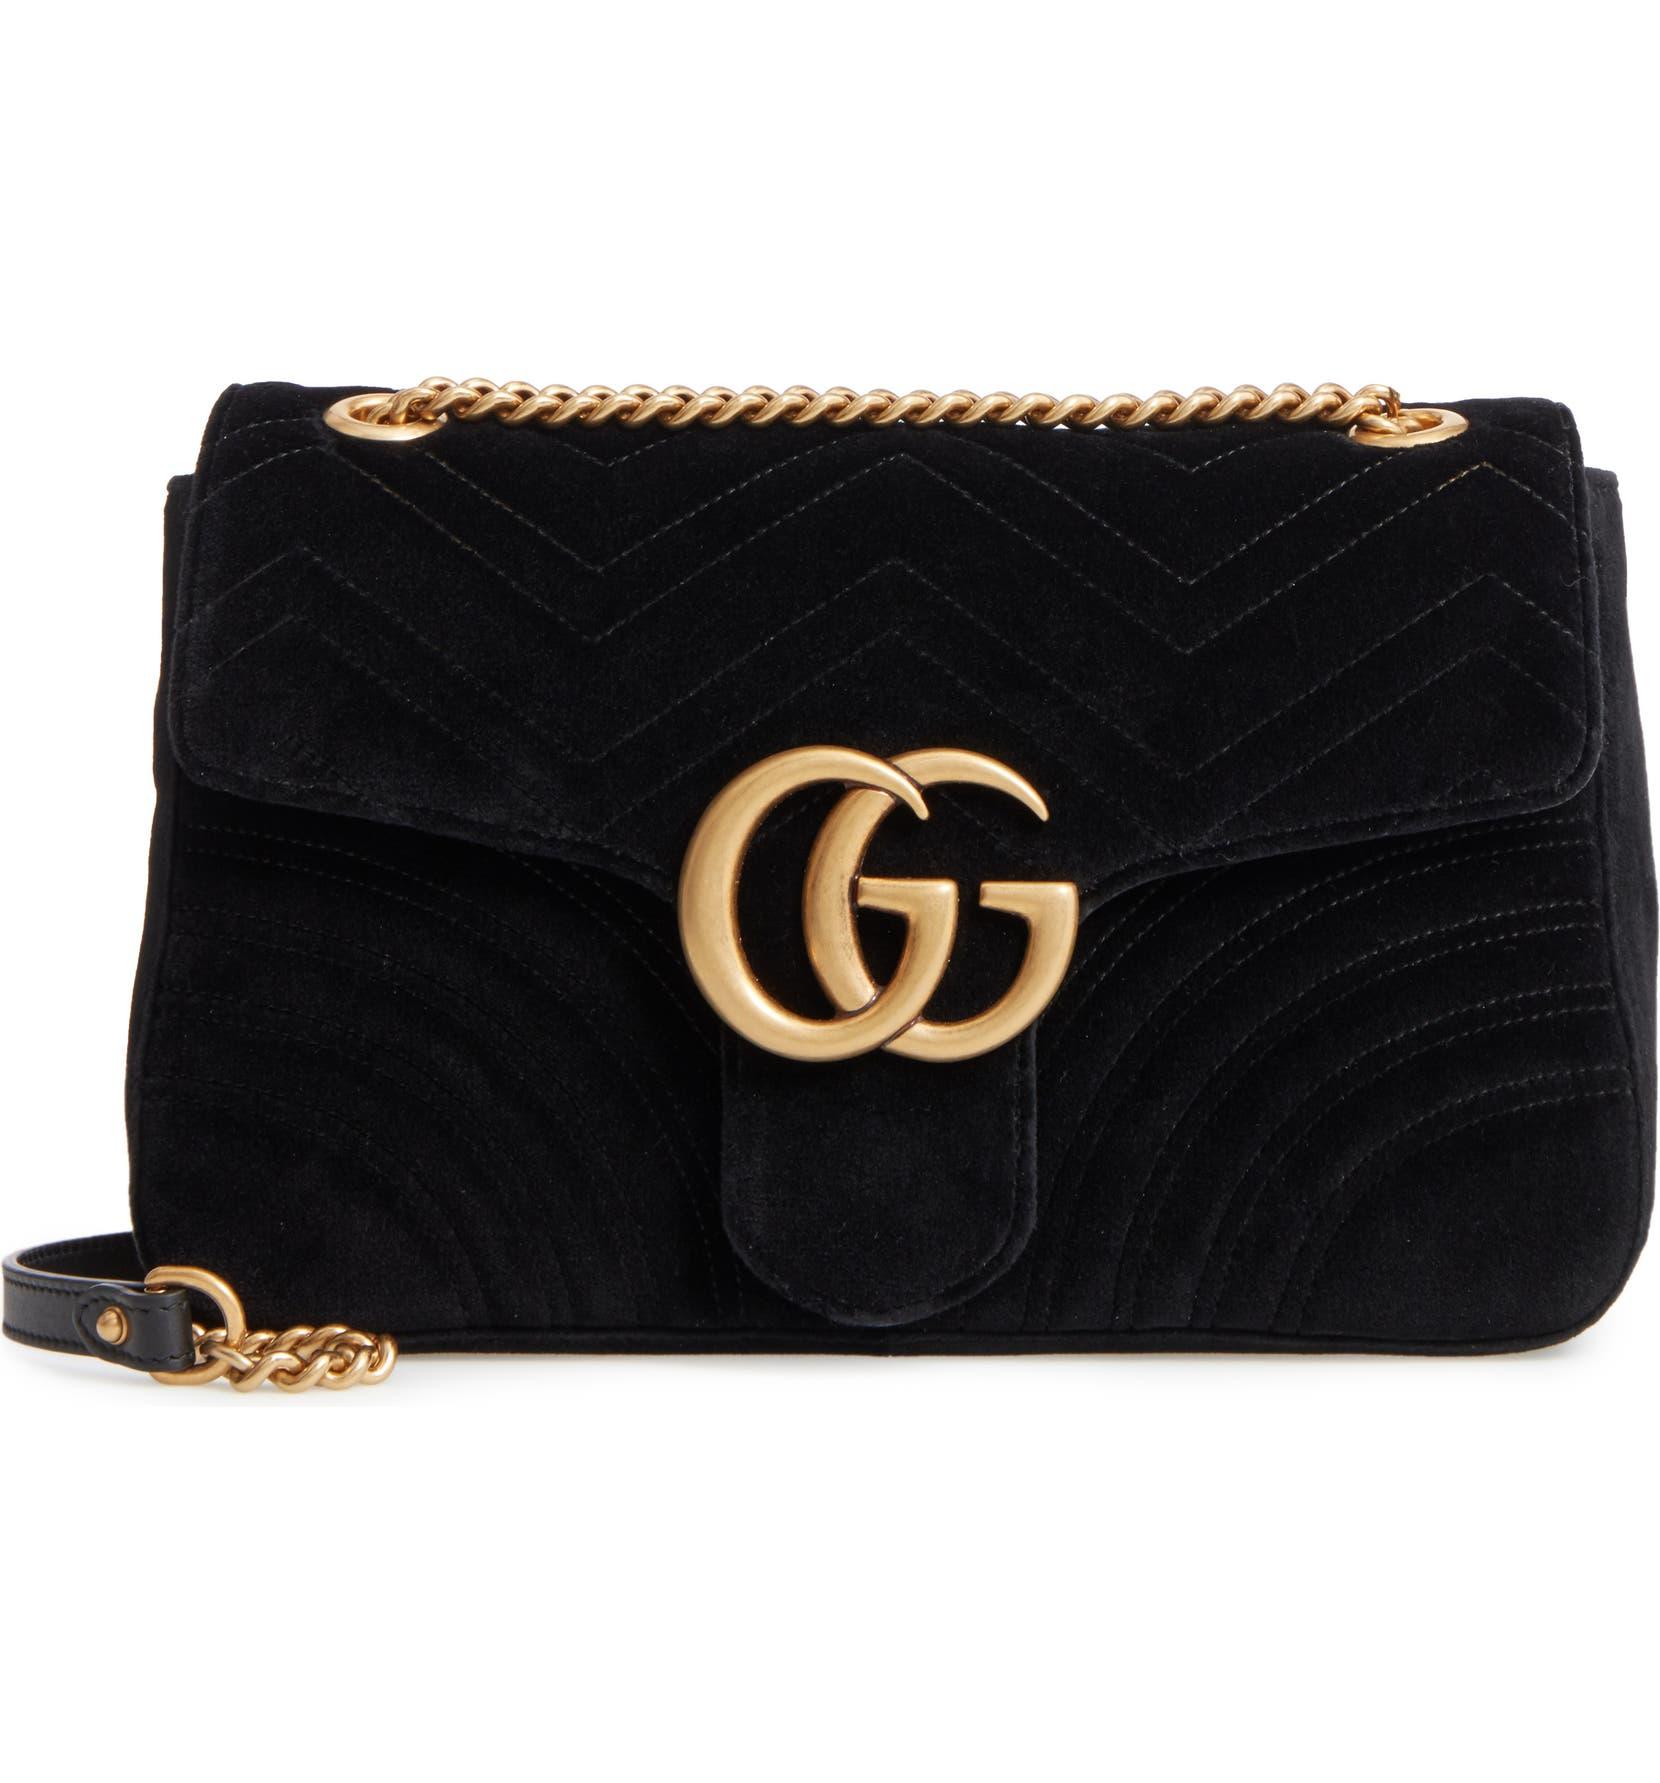 1c9e2d491b745 Gucci Medium GG Marmont 2.0 Matelassé Velvet Shoulder Bag